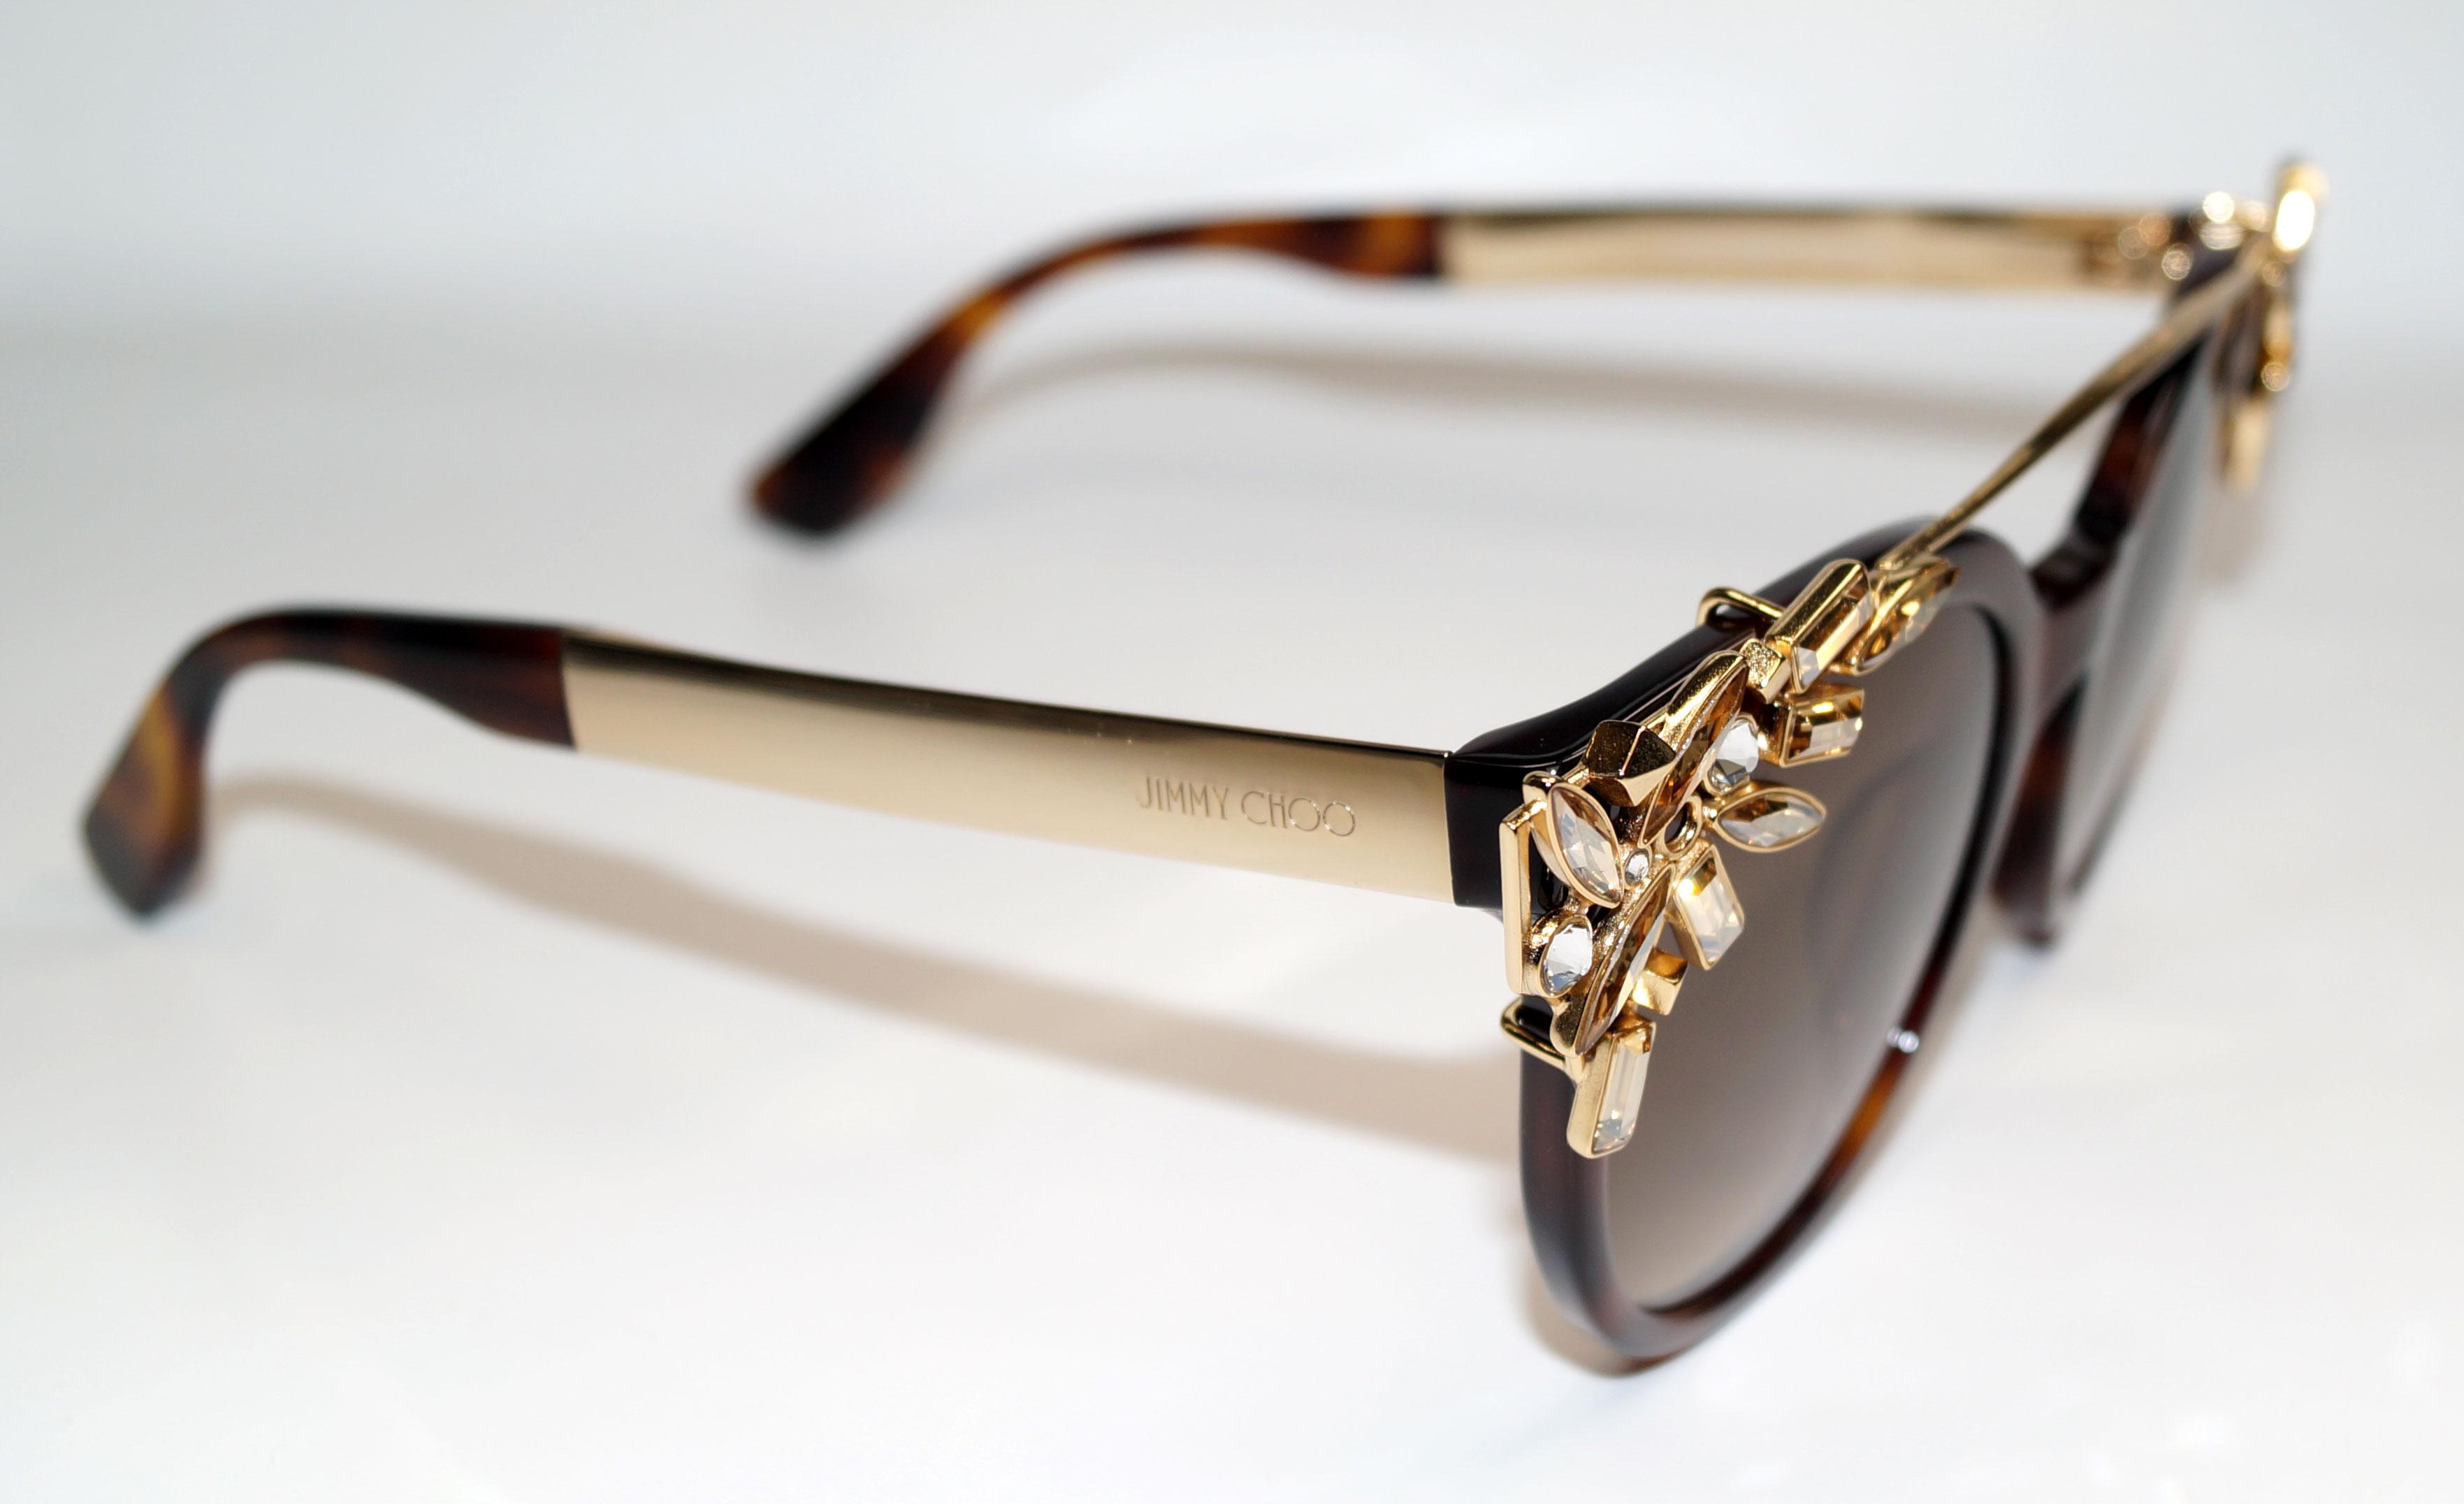 JIMMY CHOO Sonnenbrille Sunglasses VIVY BHZ JD